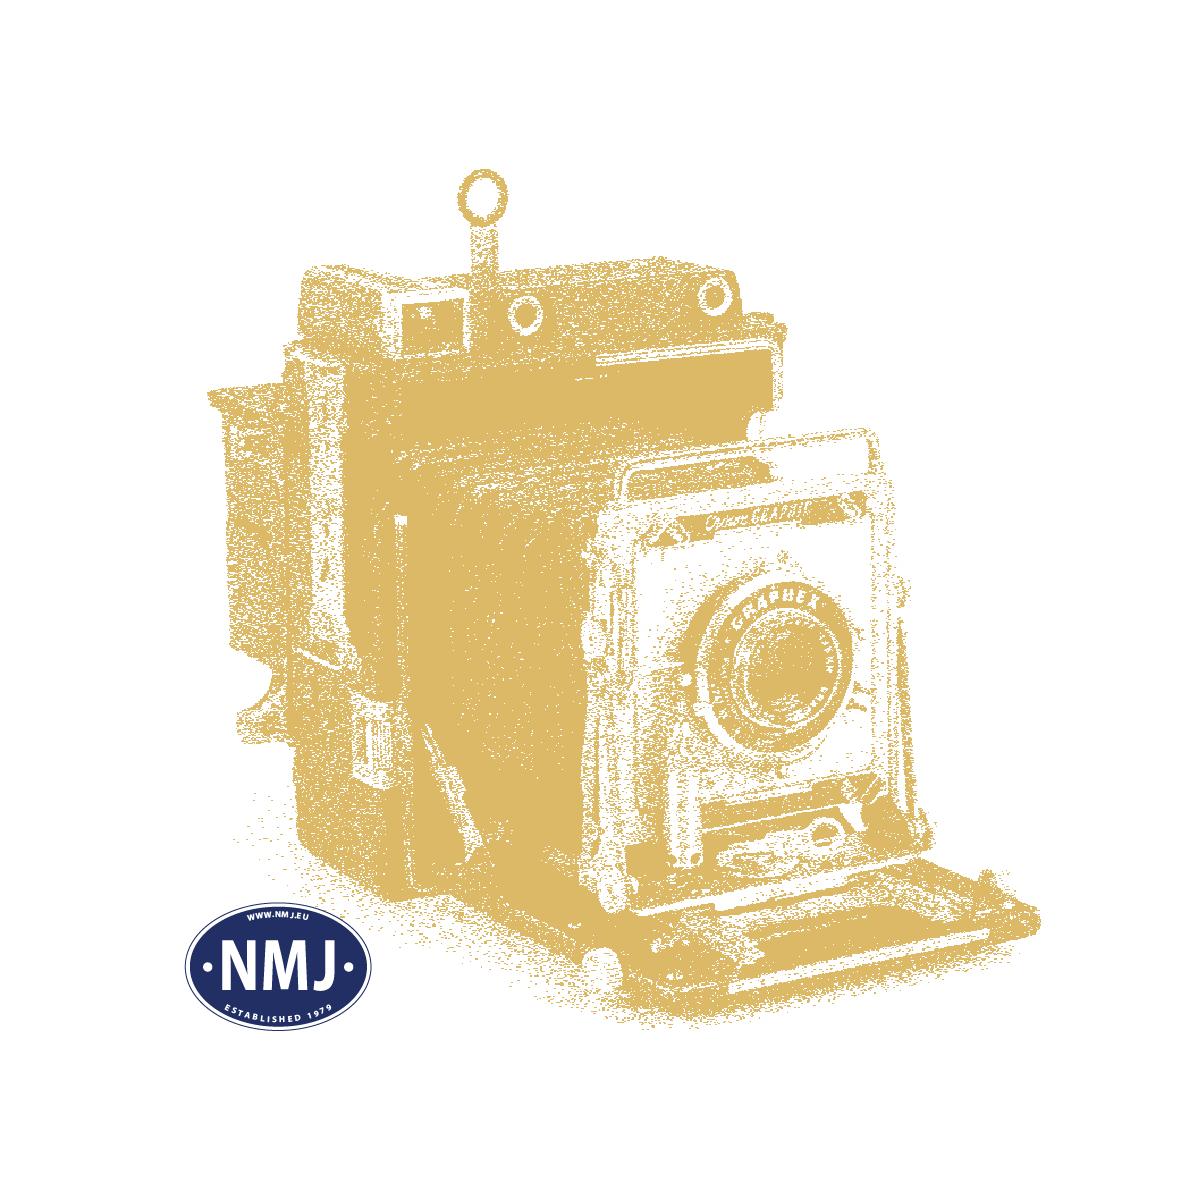 FAL172104 - Bruntippet Pensel, 0